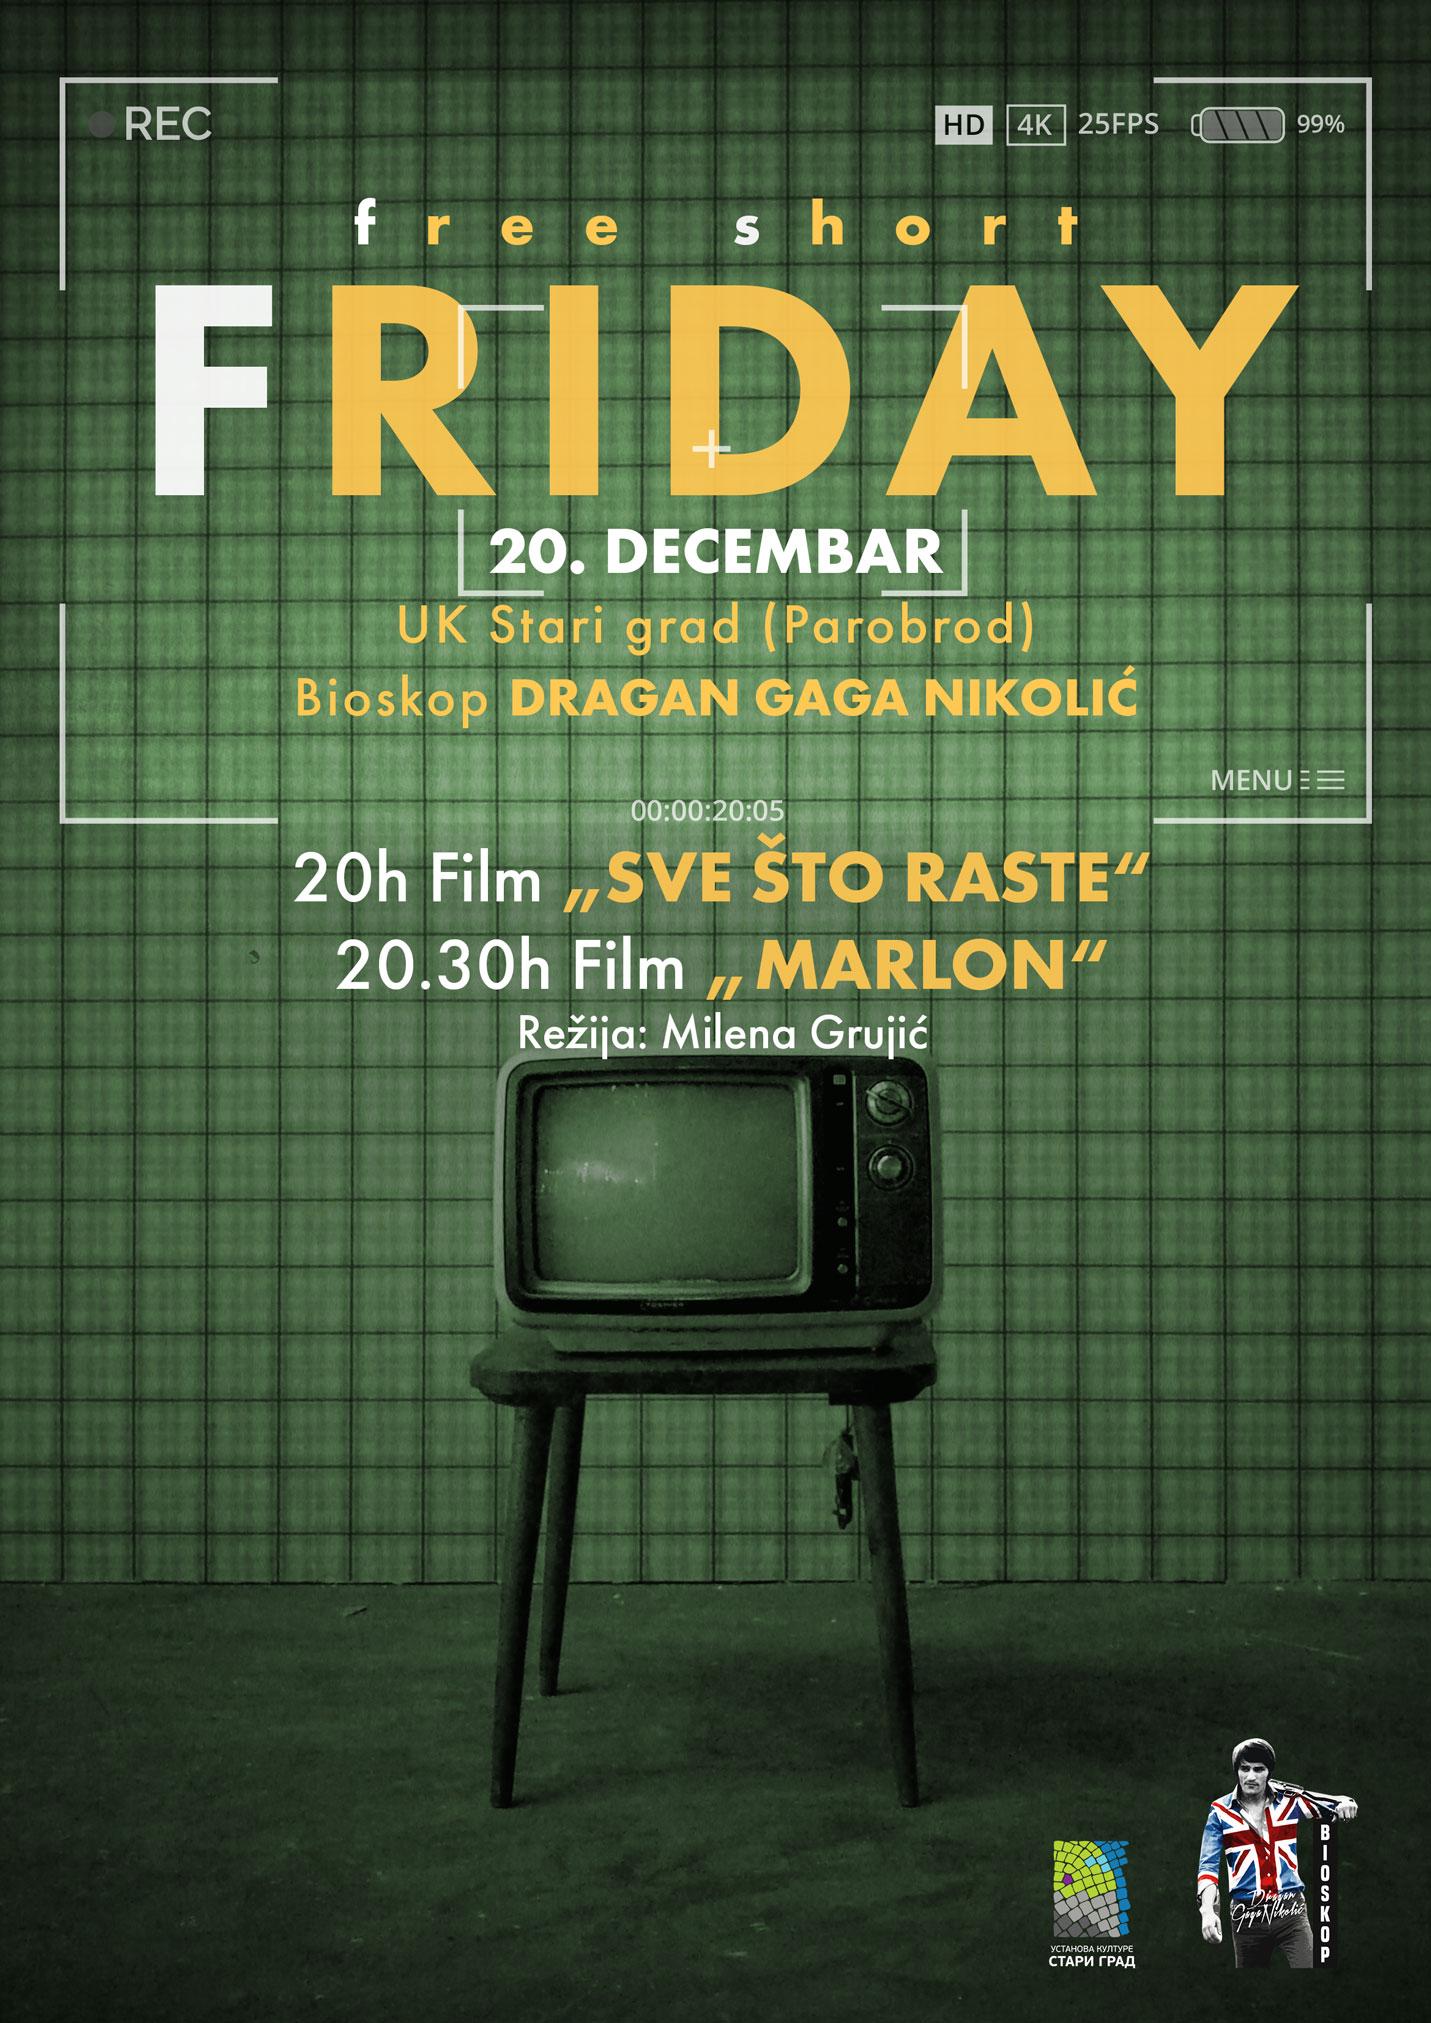 Free Short Friday